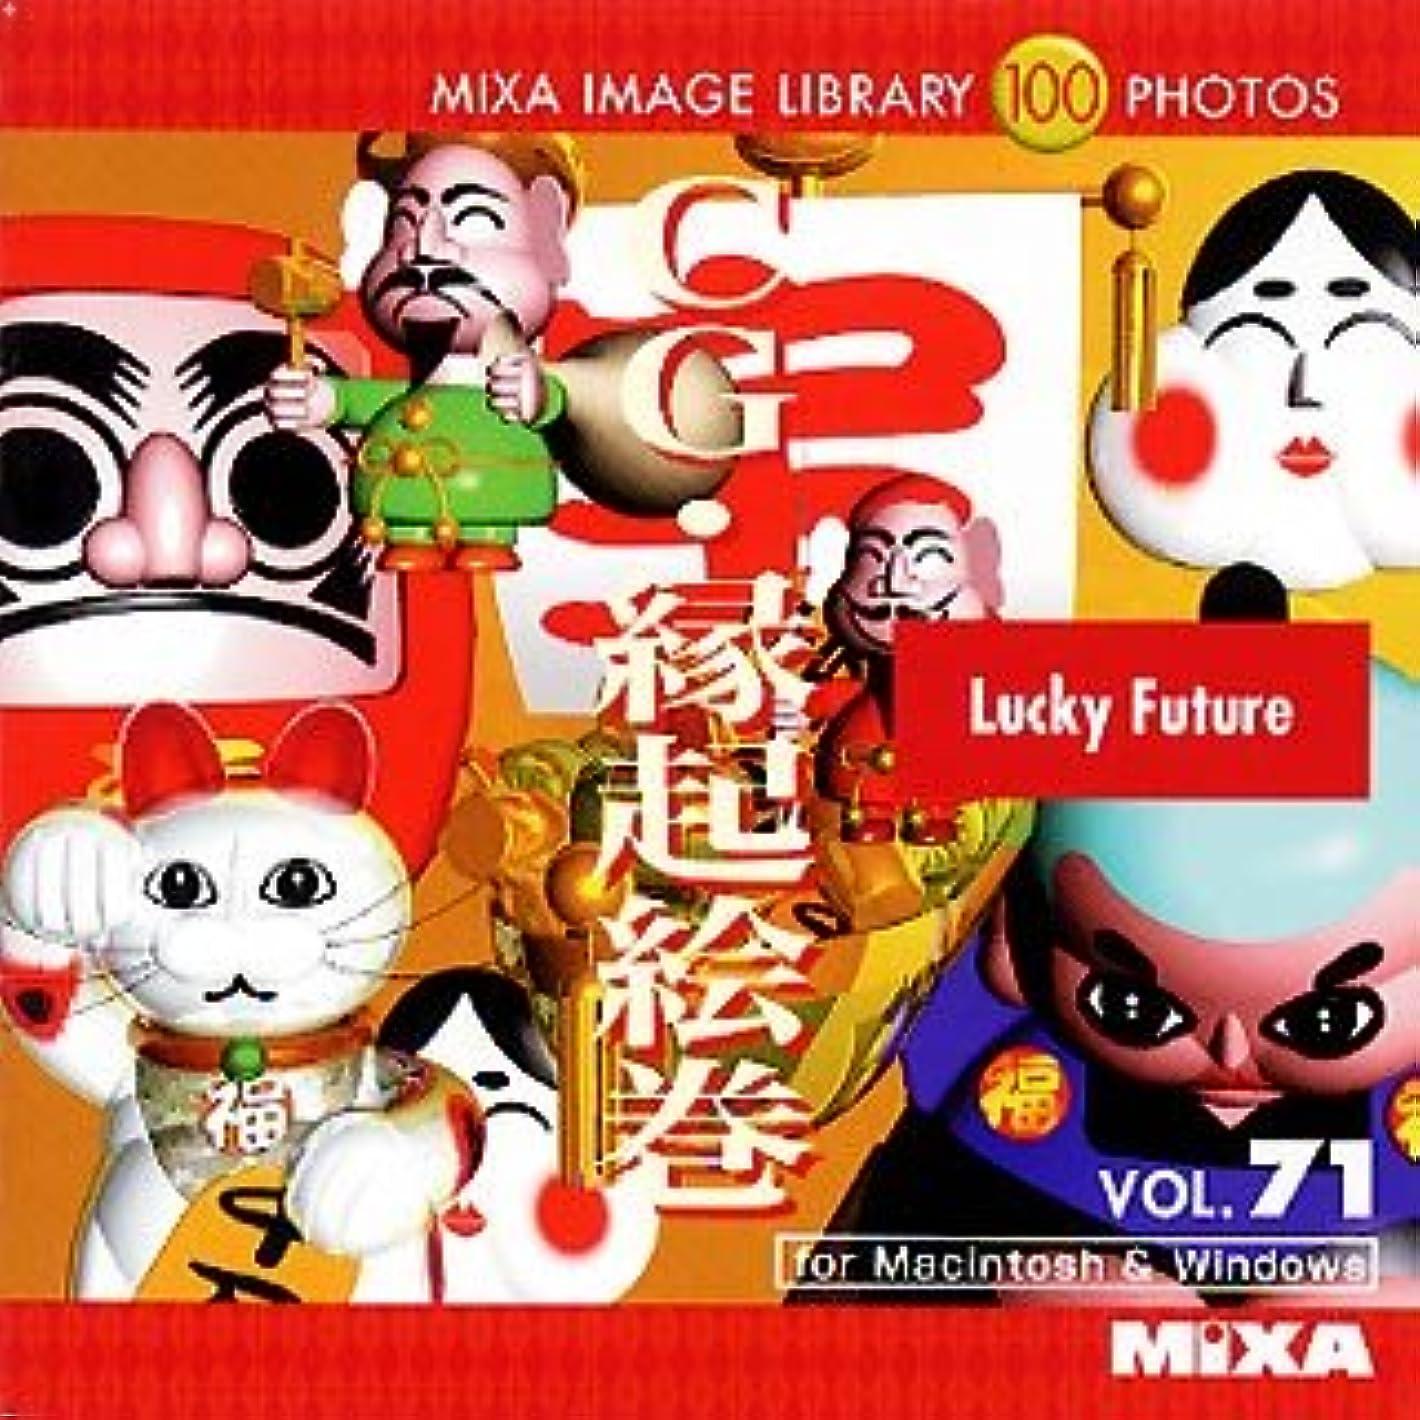 MIXA IMAGE LIBRARY Vol.71 CG?縁起絵巻